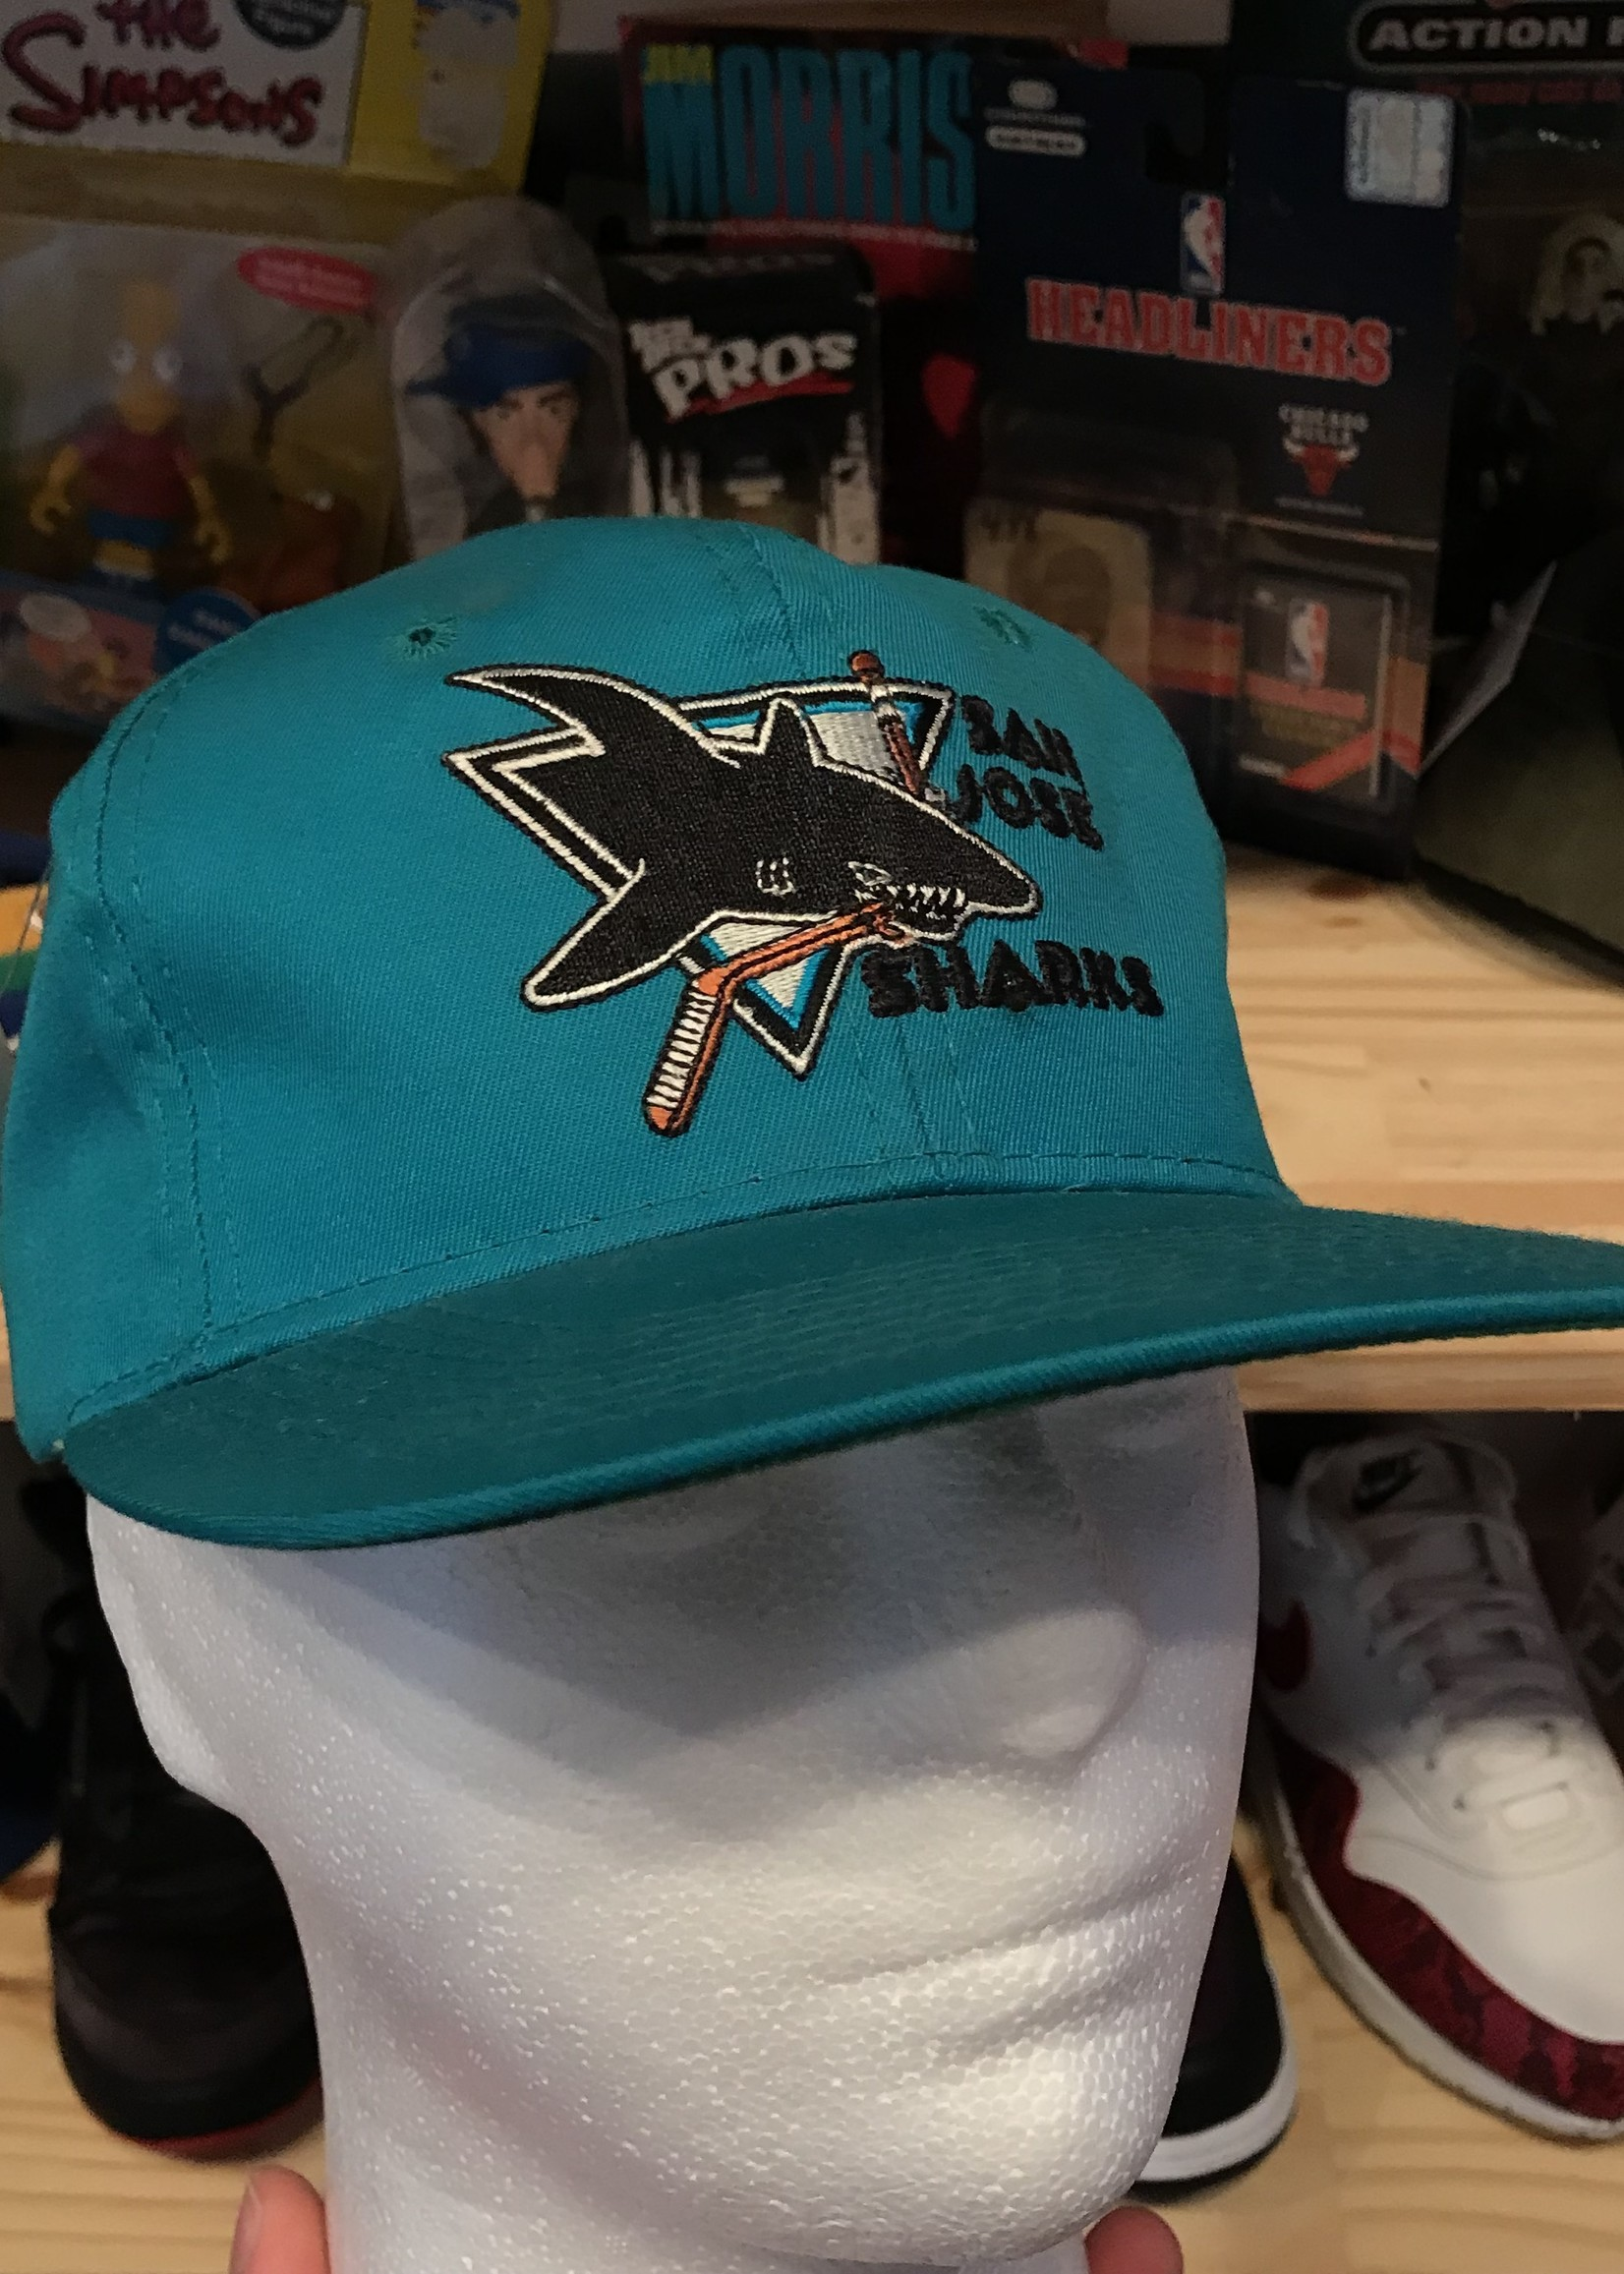 4906san jose sharks hat